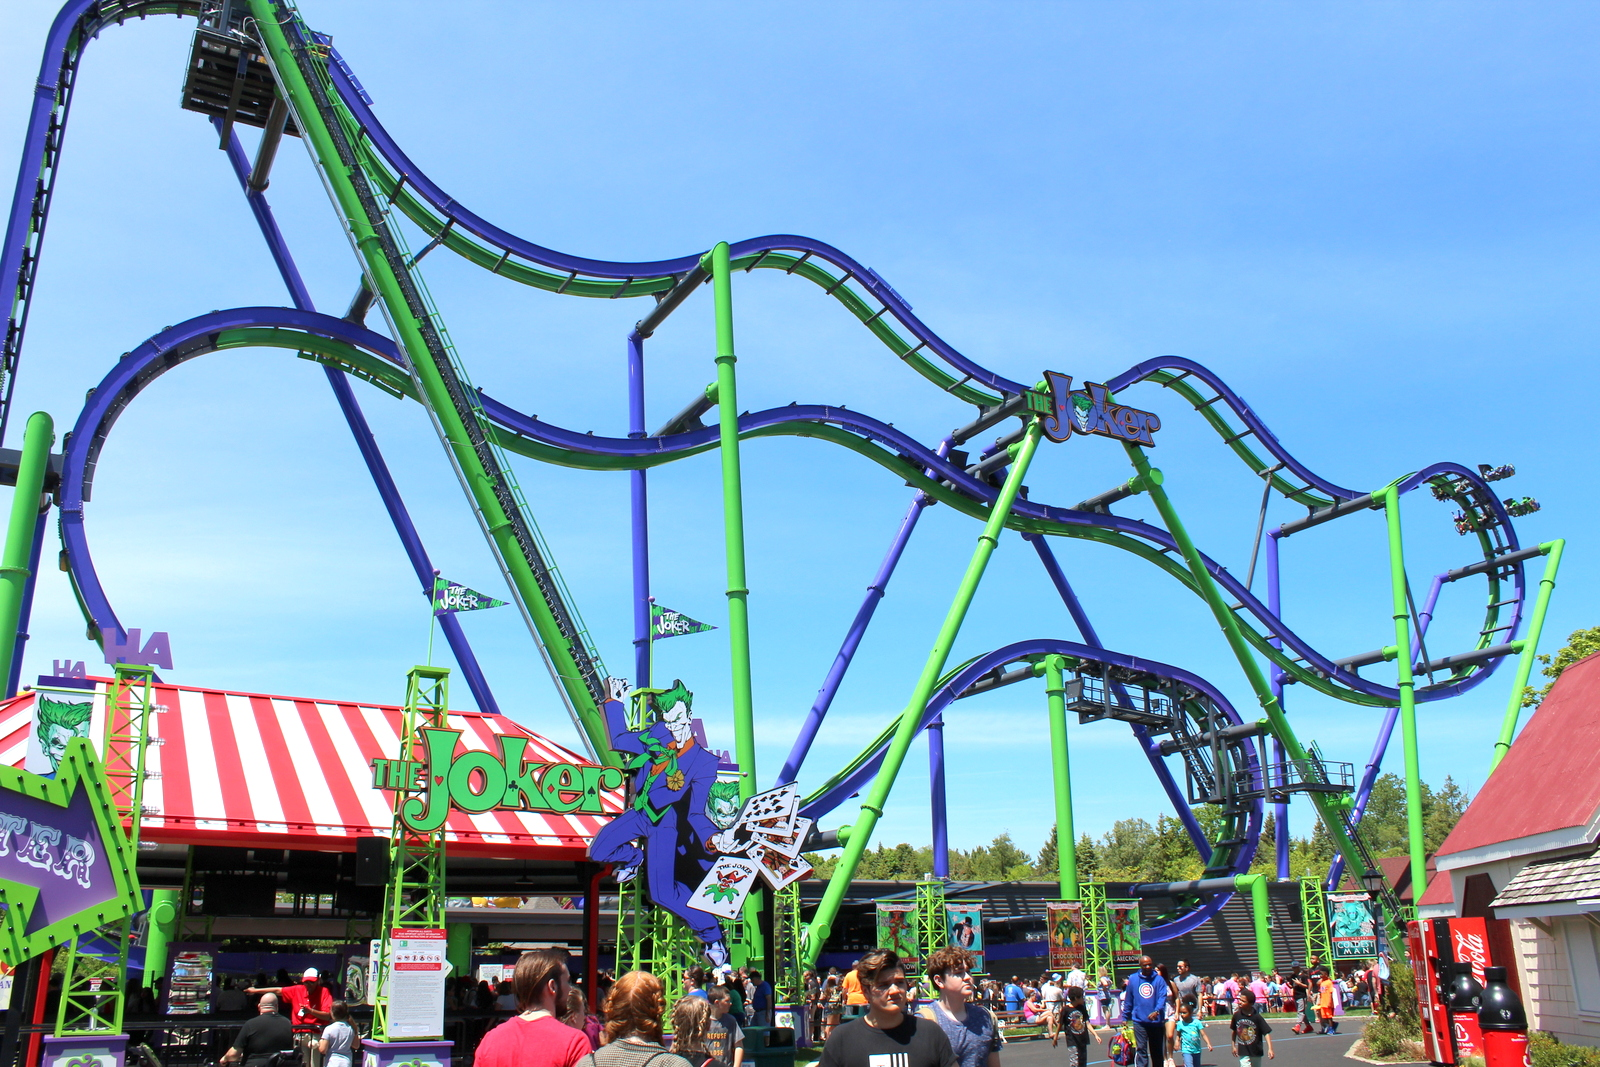 Joker at Six Flags Great America